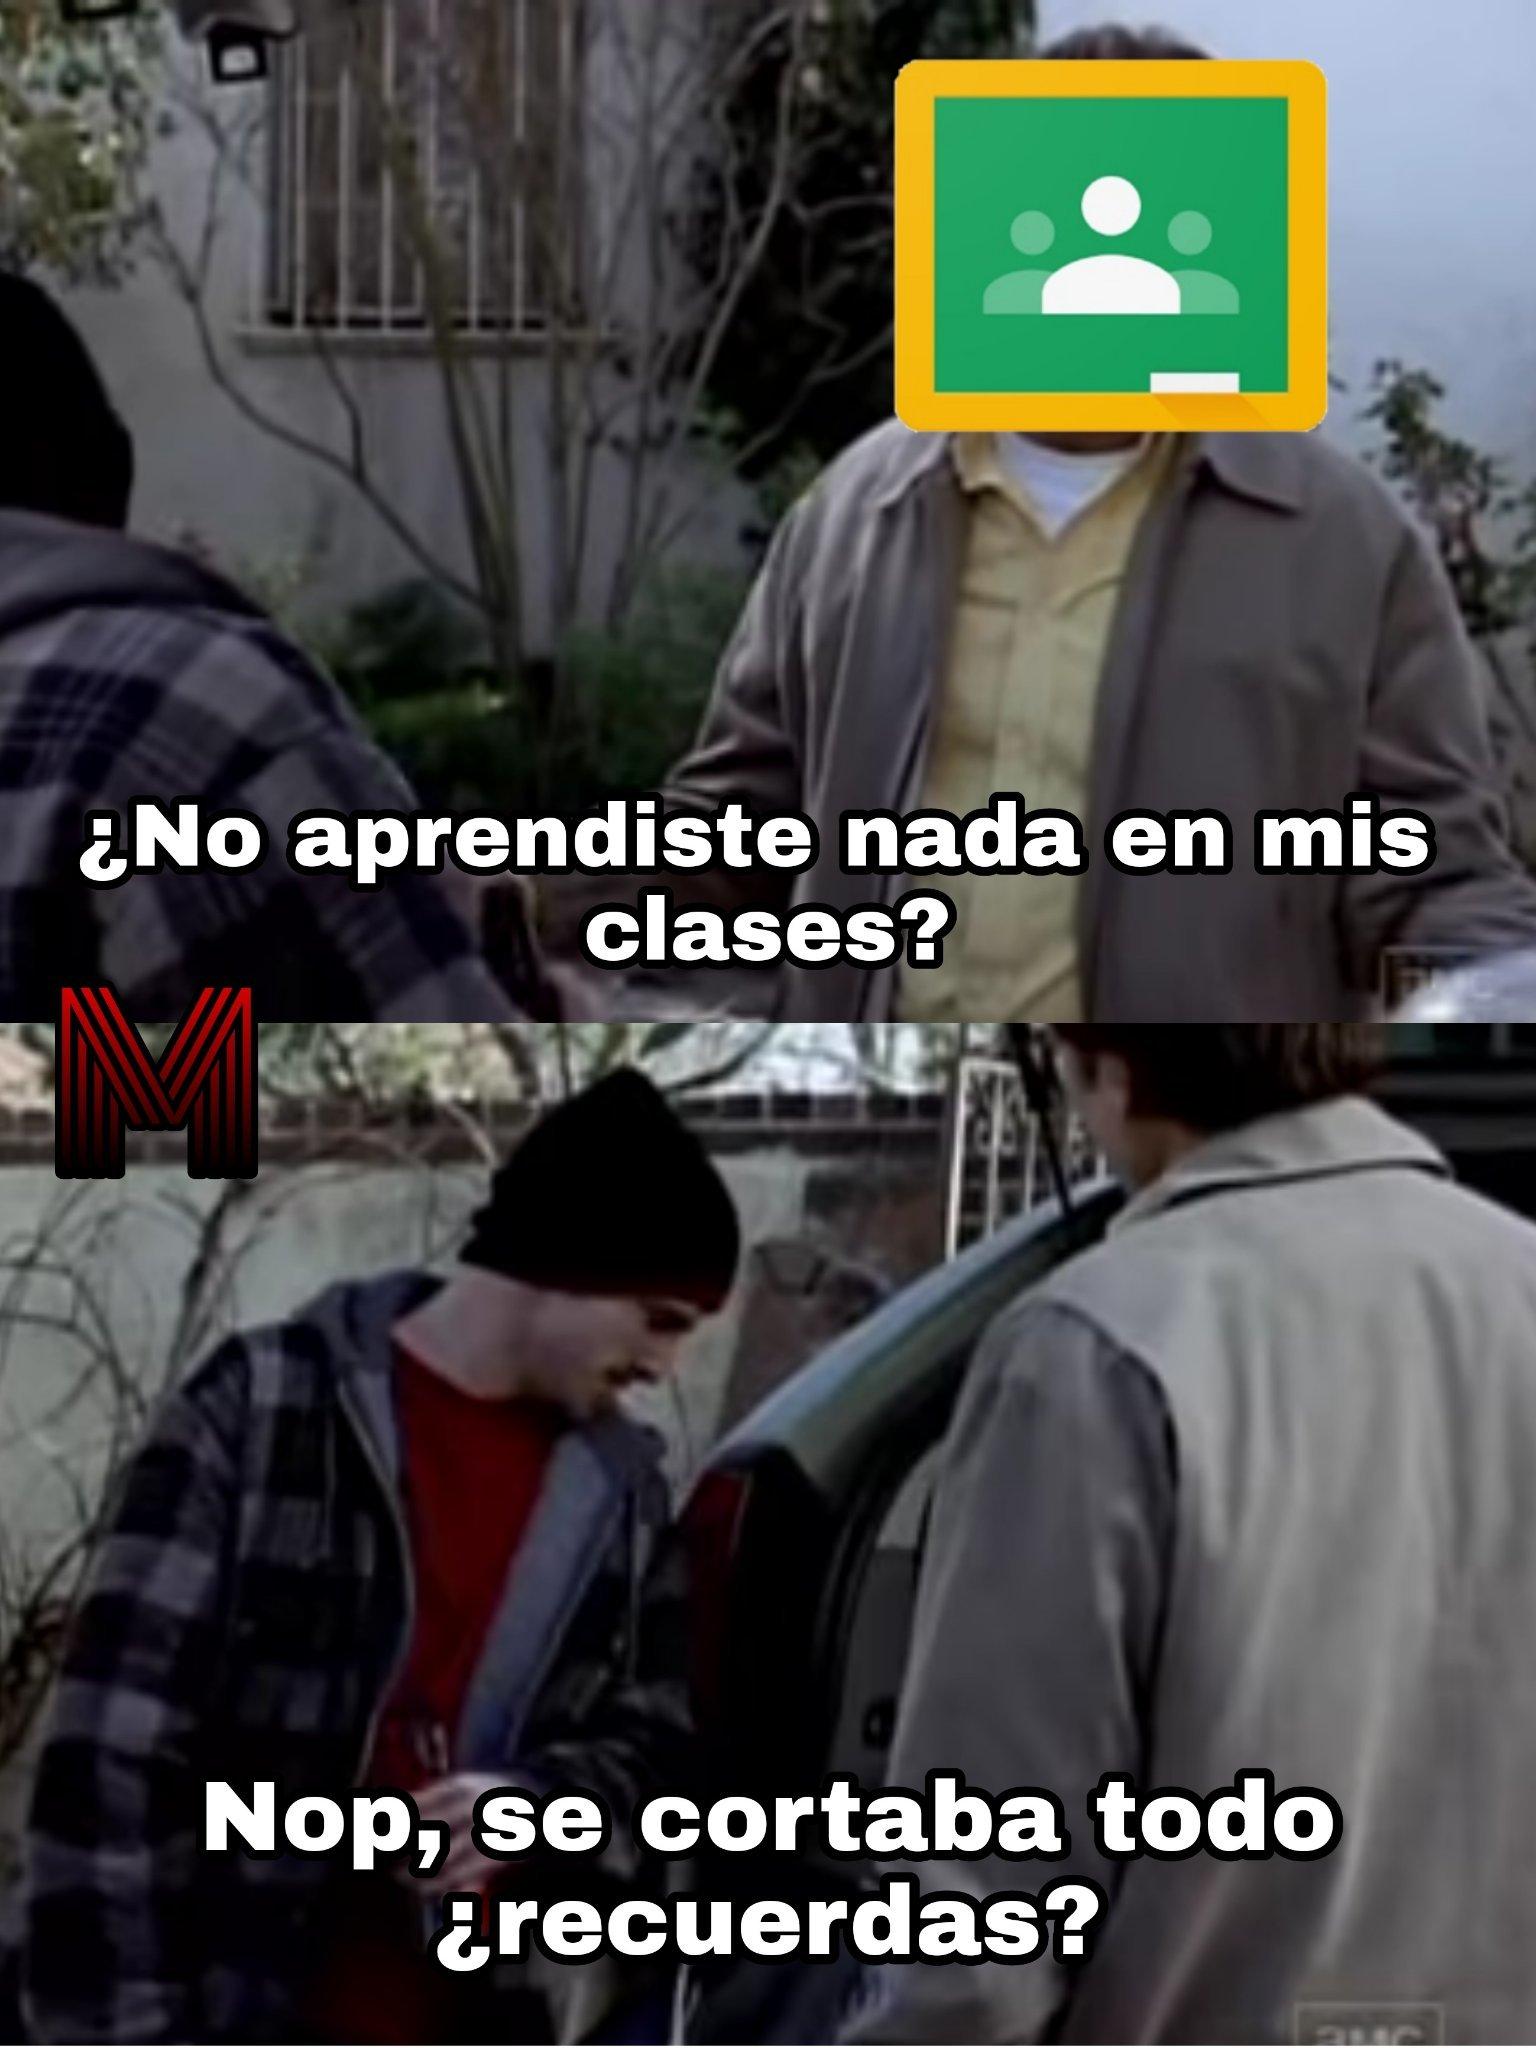 Internet tercermundista - meme